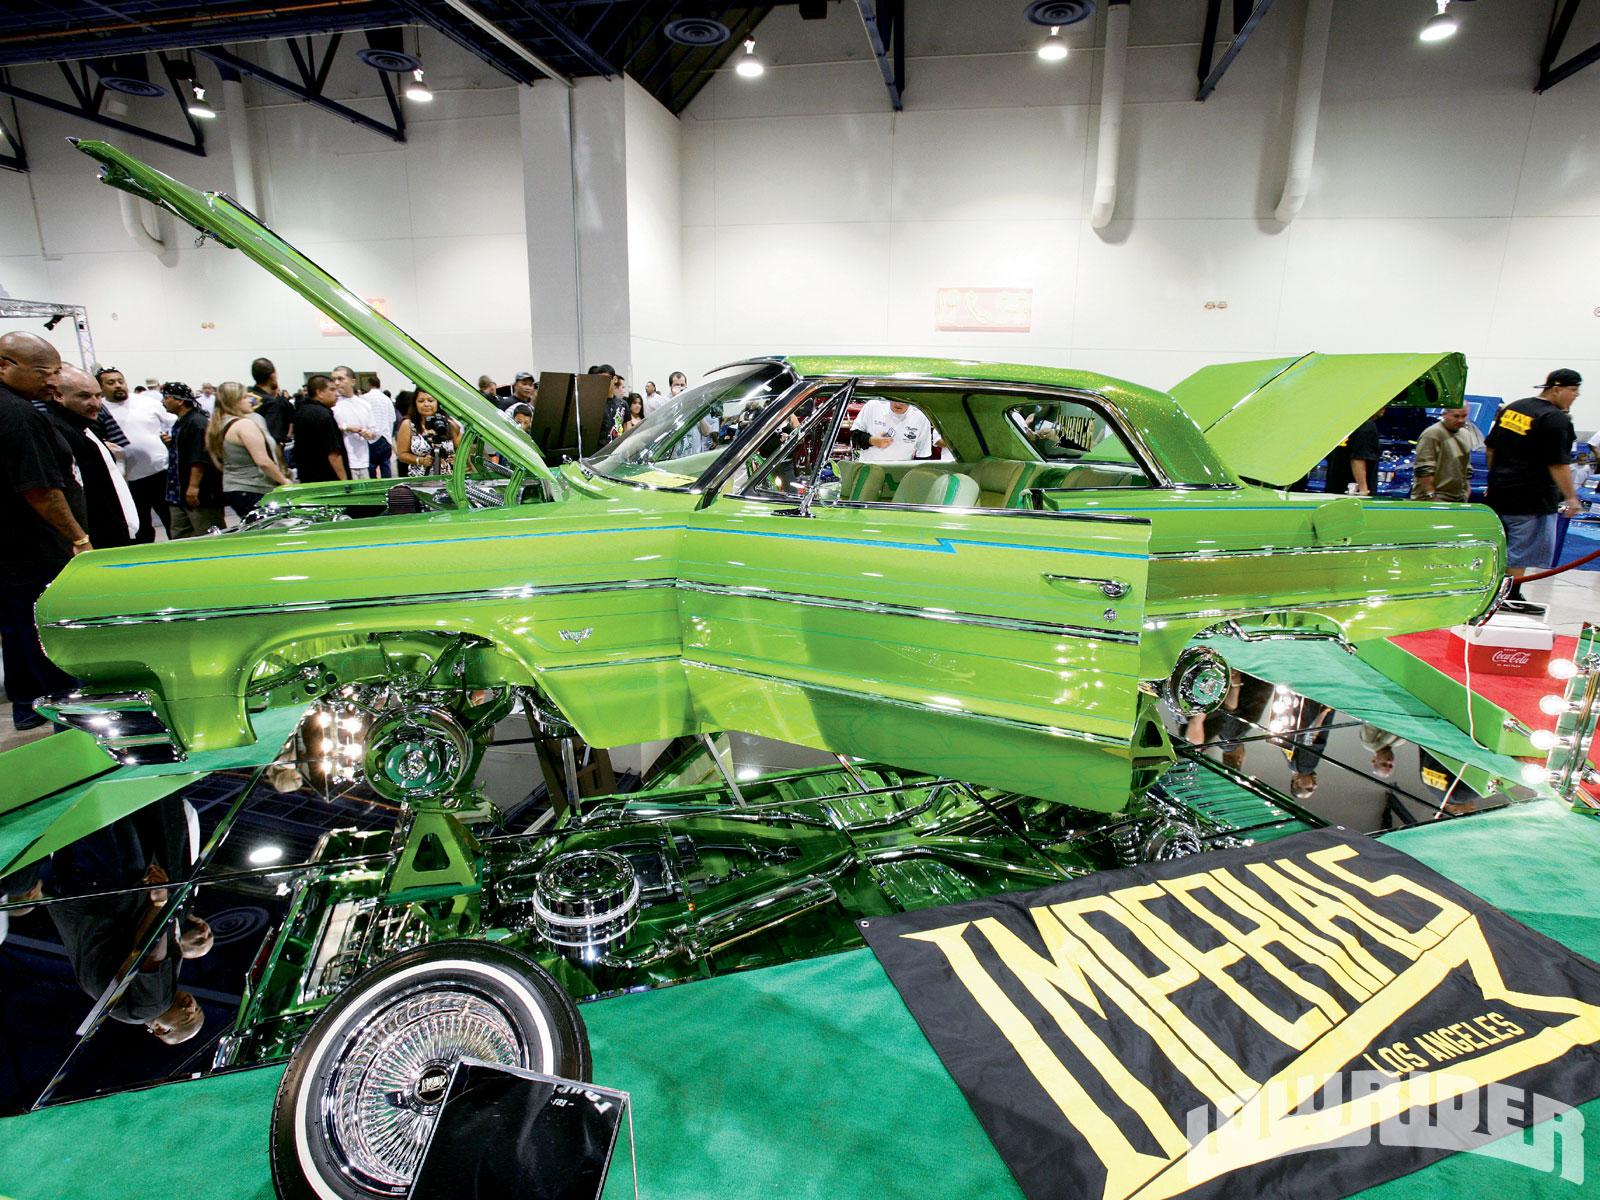 Chevy Car Accessories >> 1964 Chevy Impala - Imperials Car Club - Lowrider Magazine